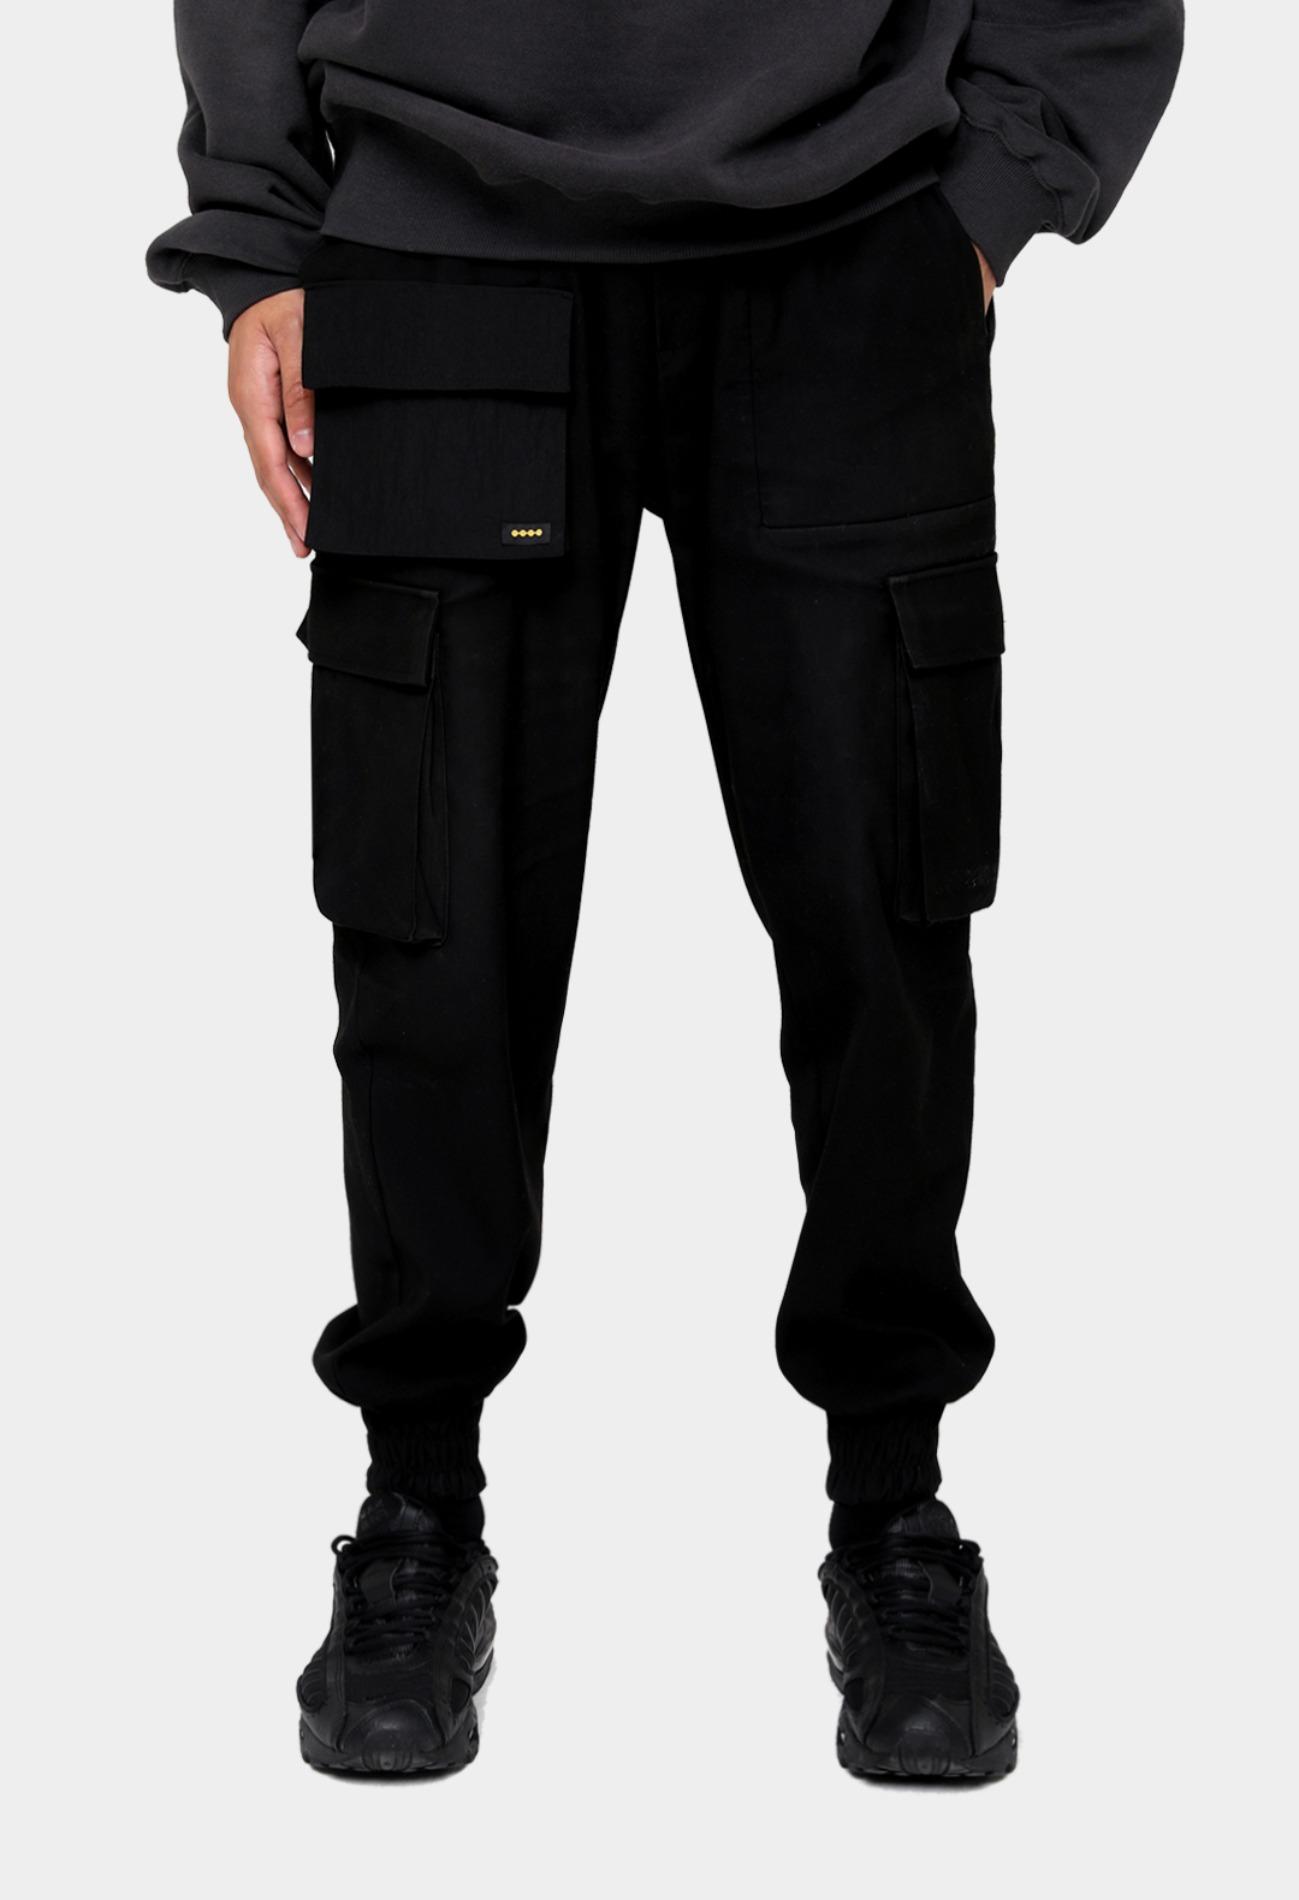 keek [Unisex] Pocket Joger Pants - Black 스트릿패션 유니섹스브랜드 커플시밀러룩 남자쇼핑몰 여성의류쇼핑몰 후드티 힙색